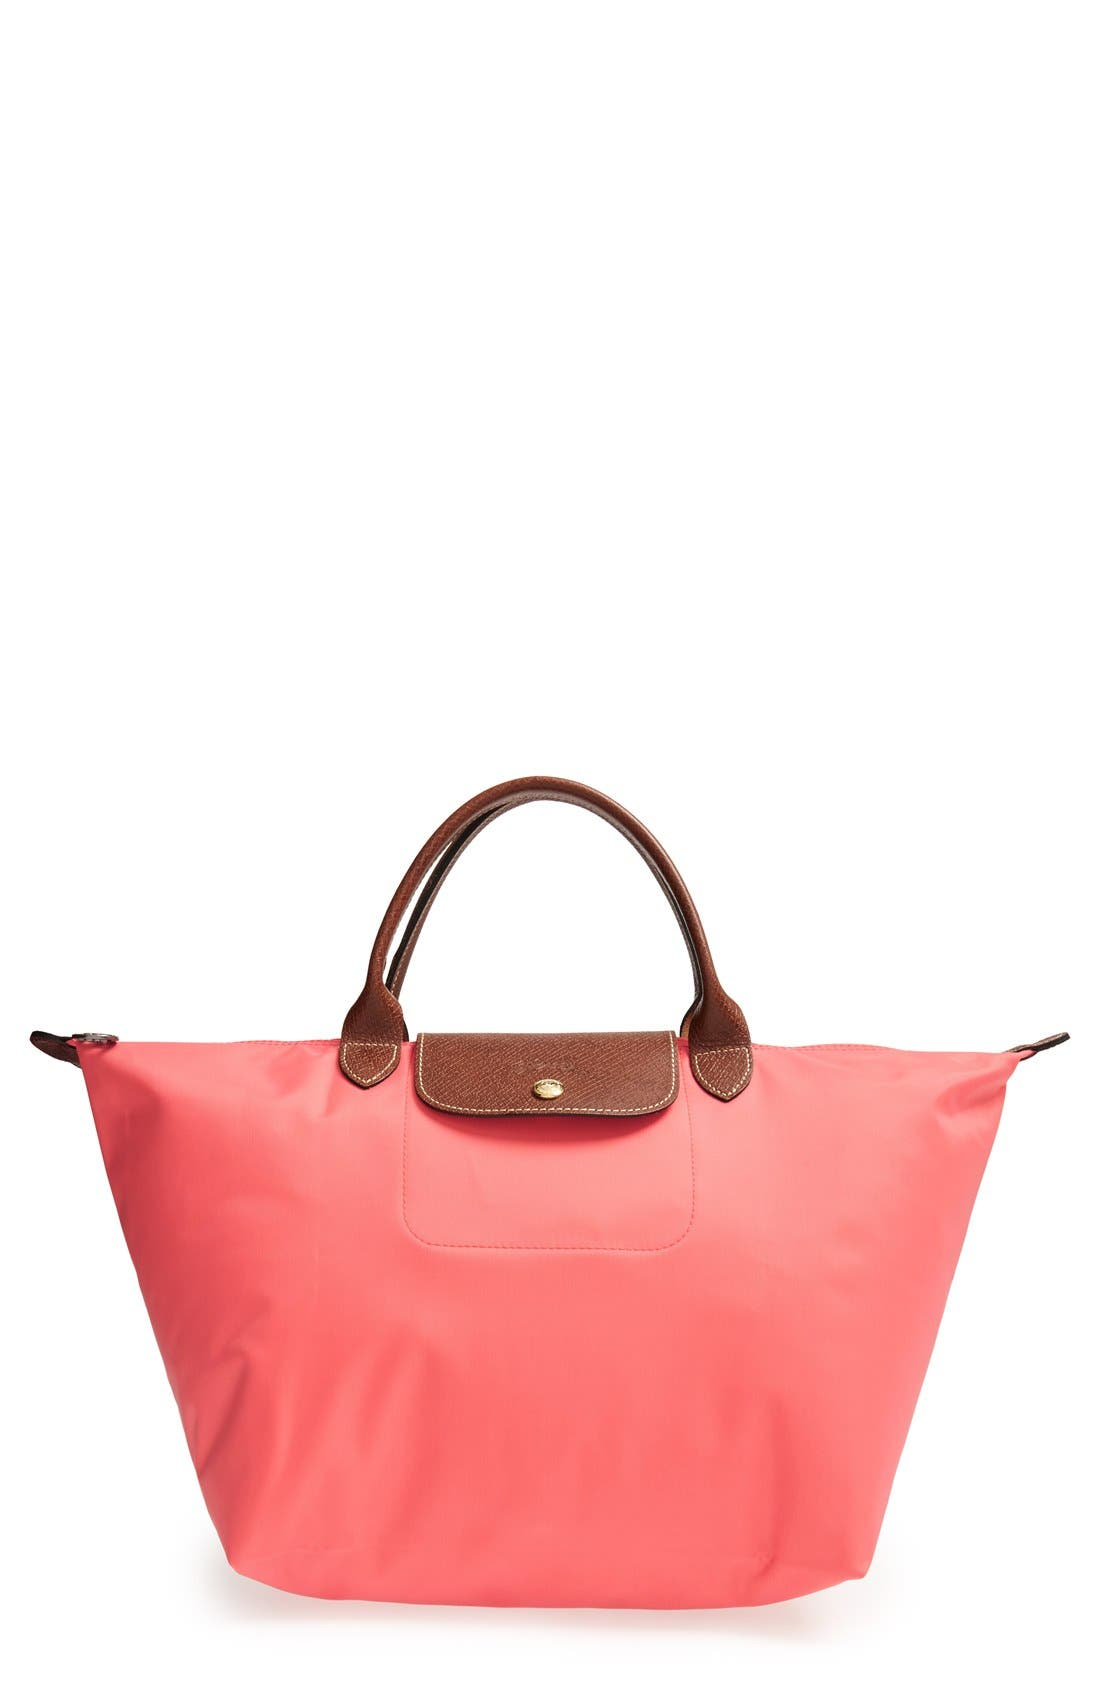 Main Image - Longchamp 'Medium Le Pliage' Nylon Tote